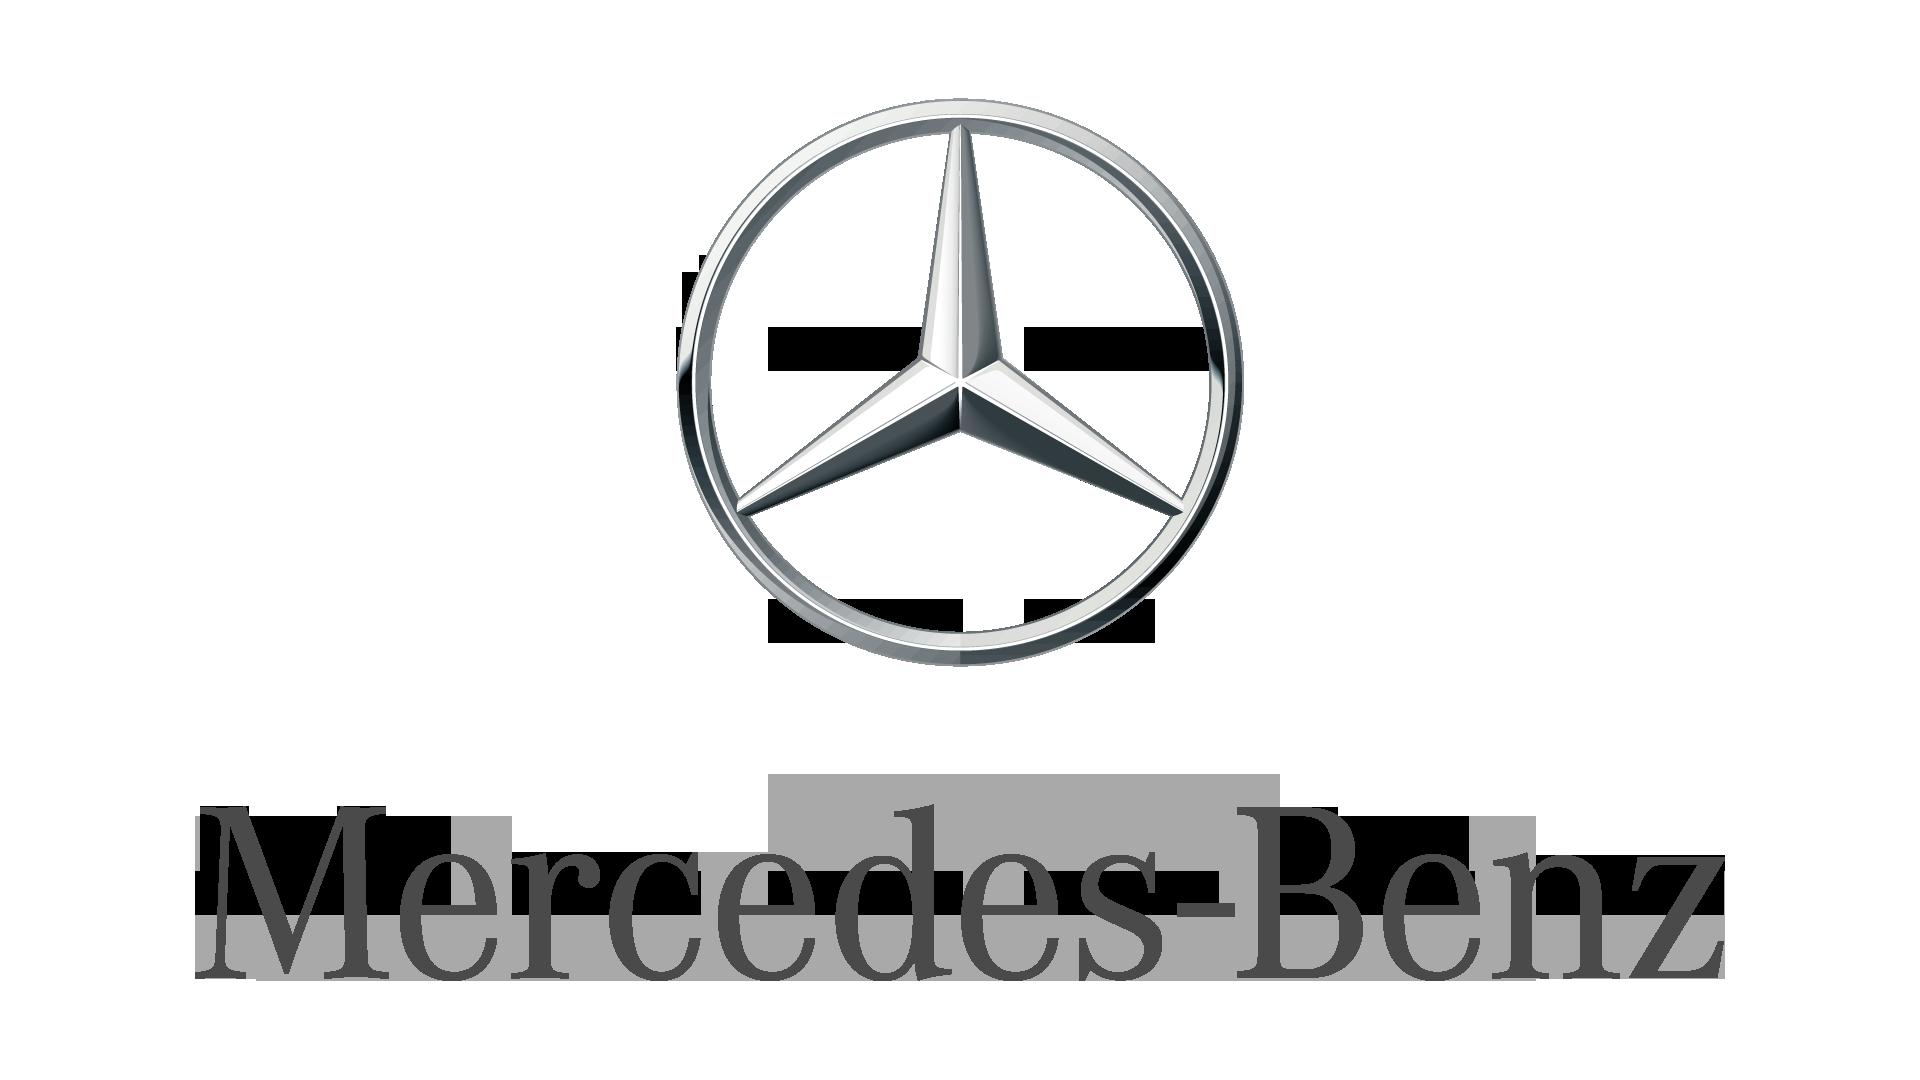 Mercedes-Benz-logo-2011-1920x1080 (1).pn